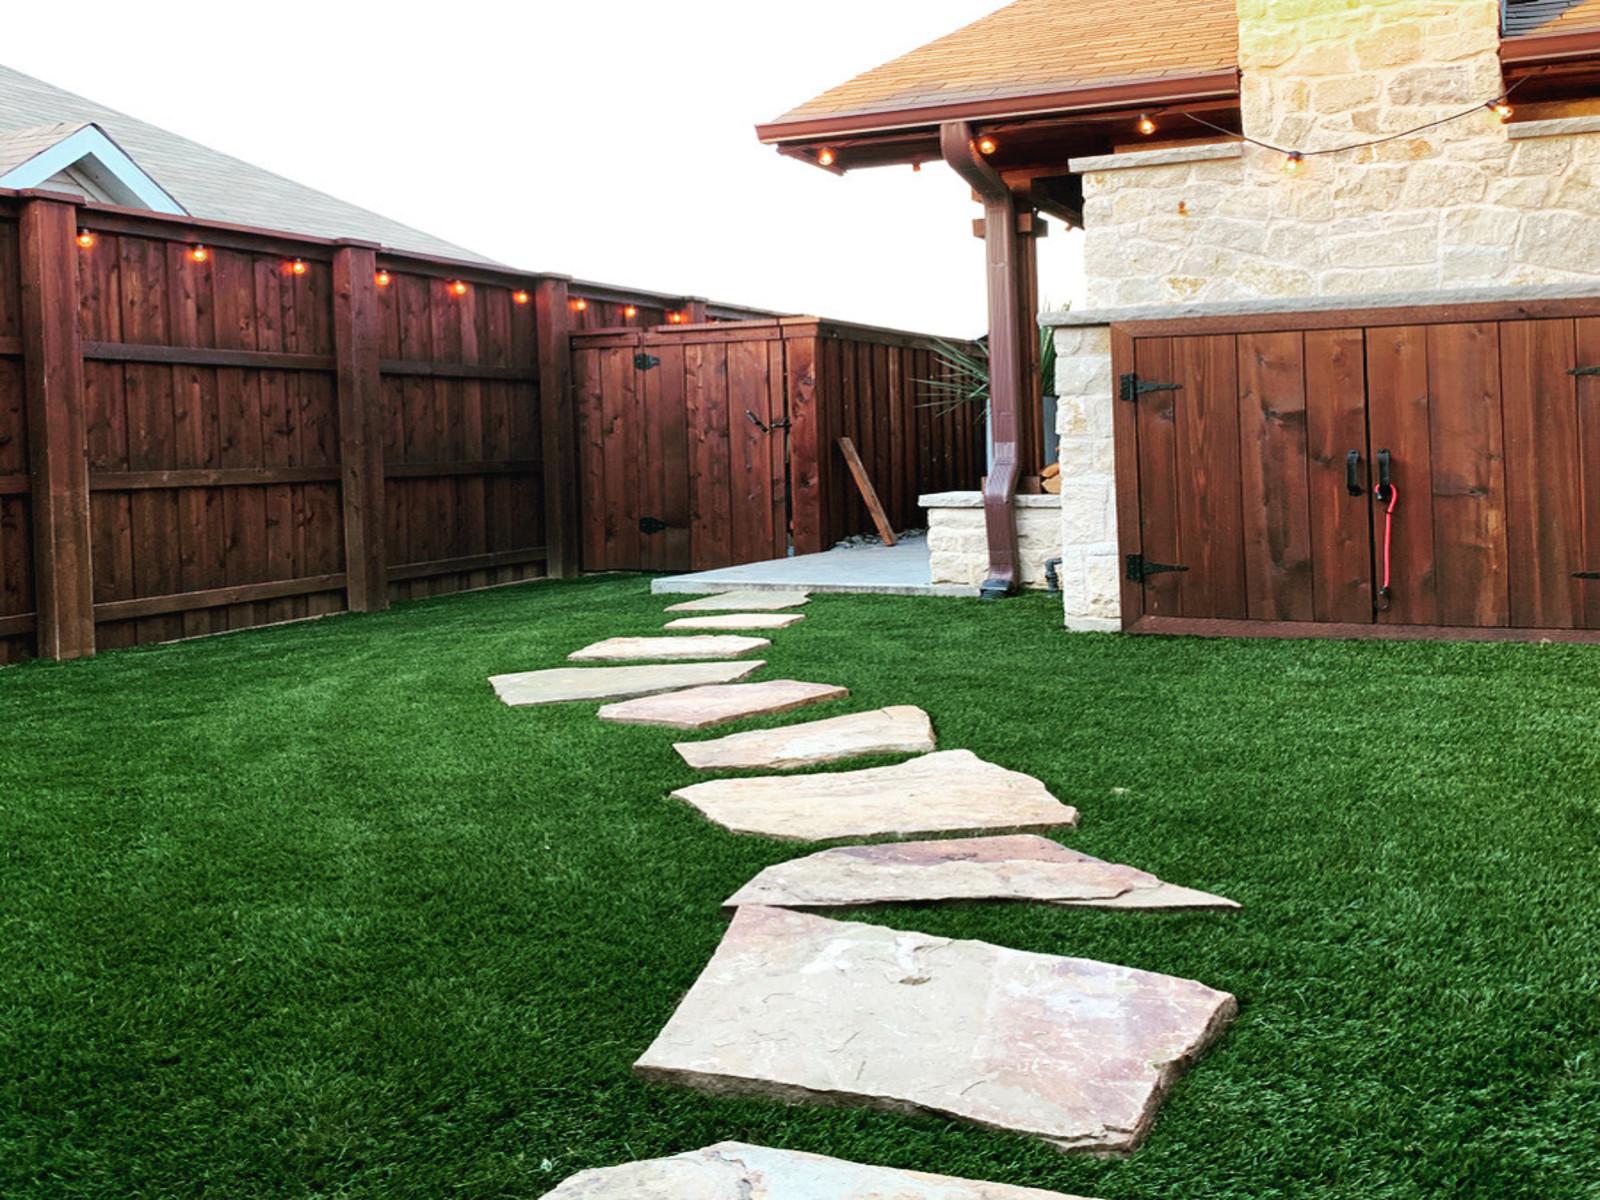 Artificial turf in residential backyard